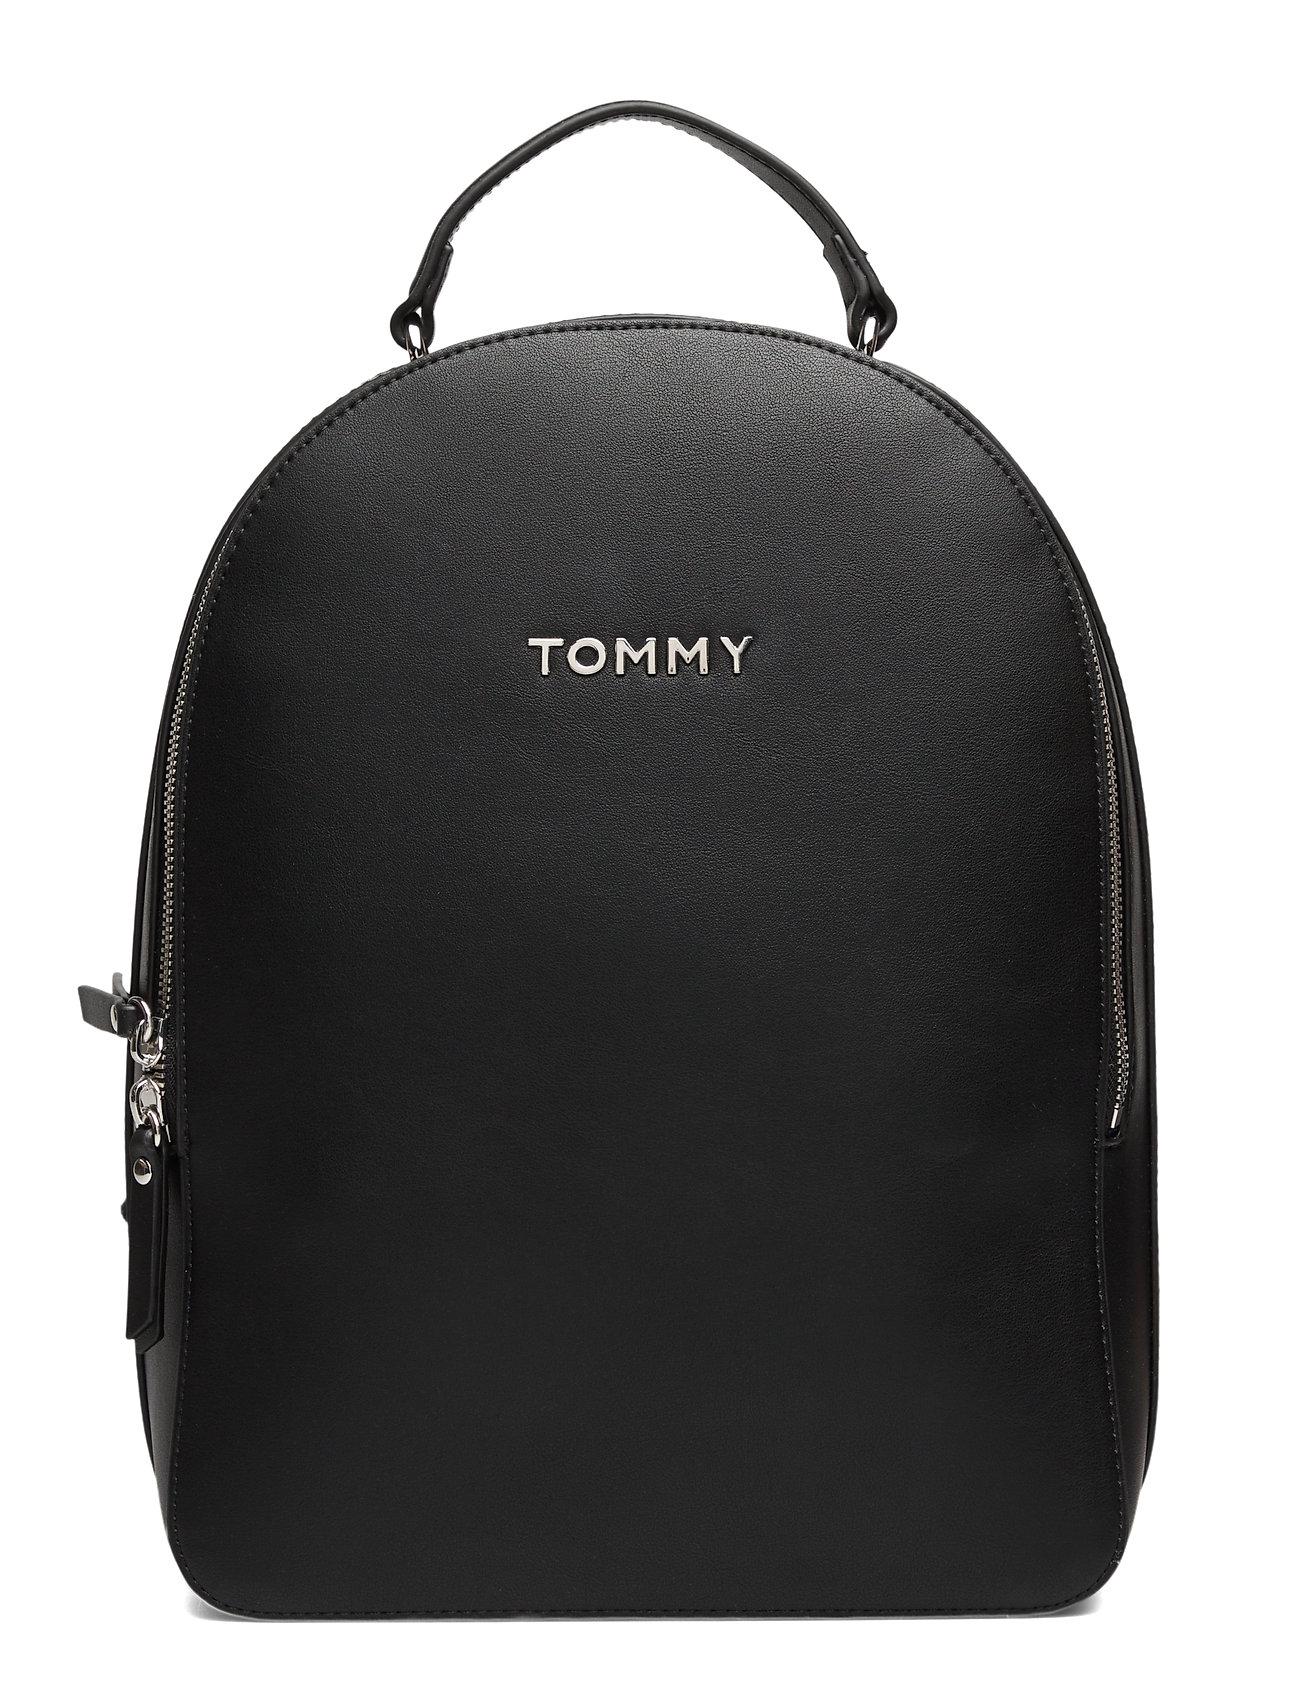 Image of Tommy Staple Dome Backpack Bags Backpacks Fashion Backpacks Sort Tommy Hilfiger (3337005115)